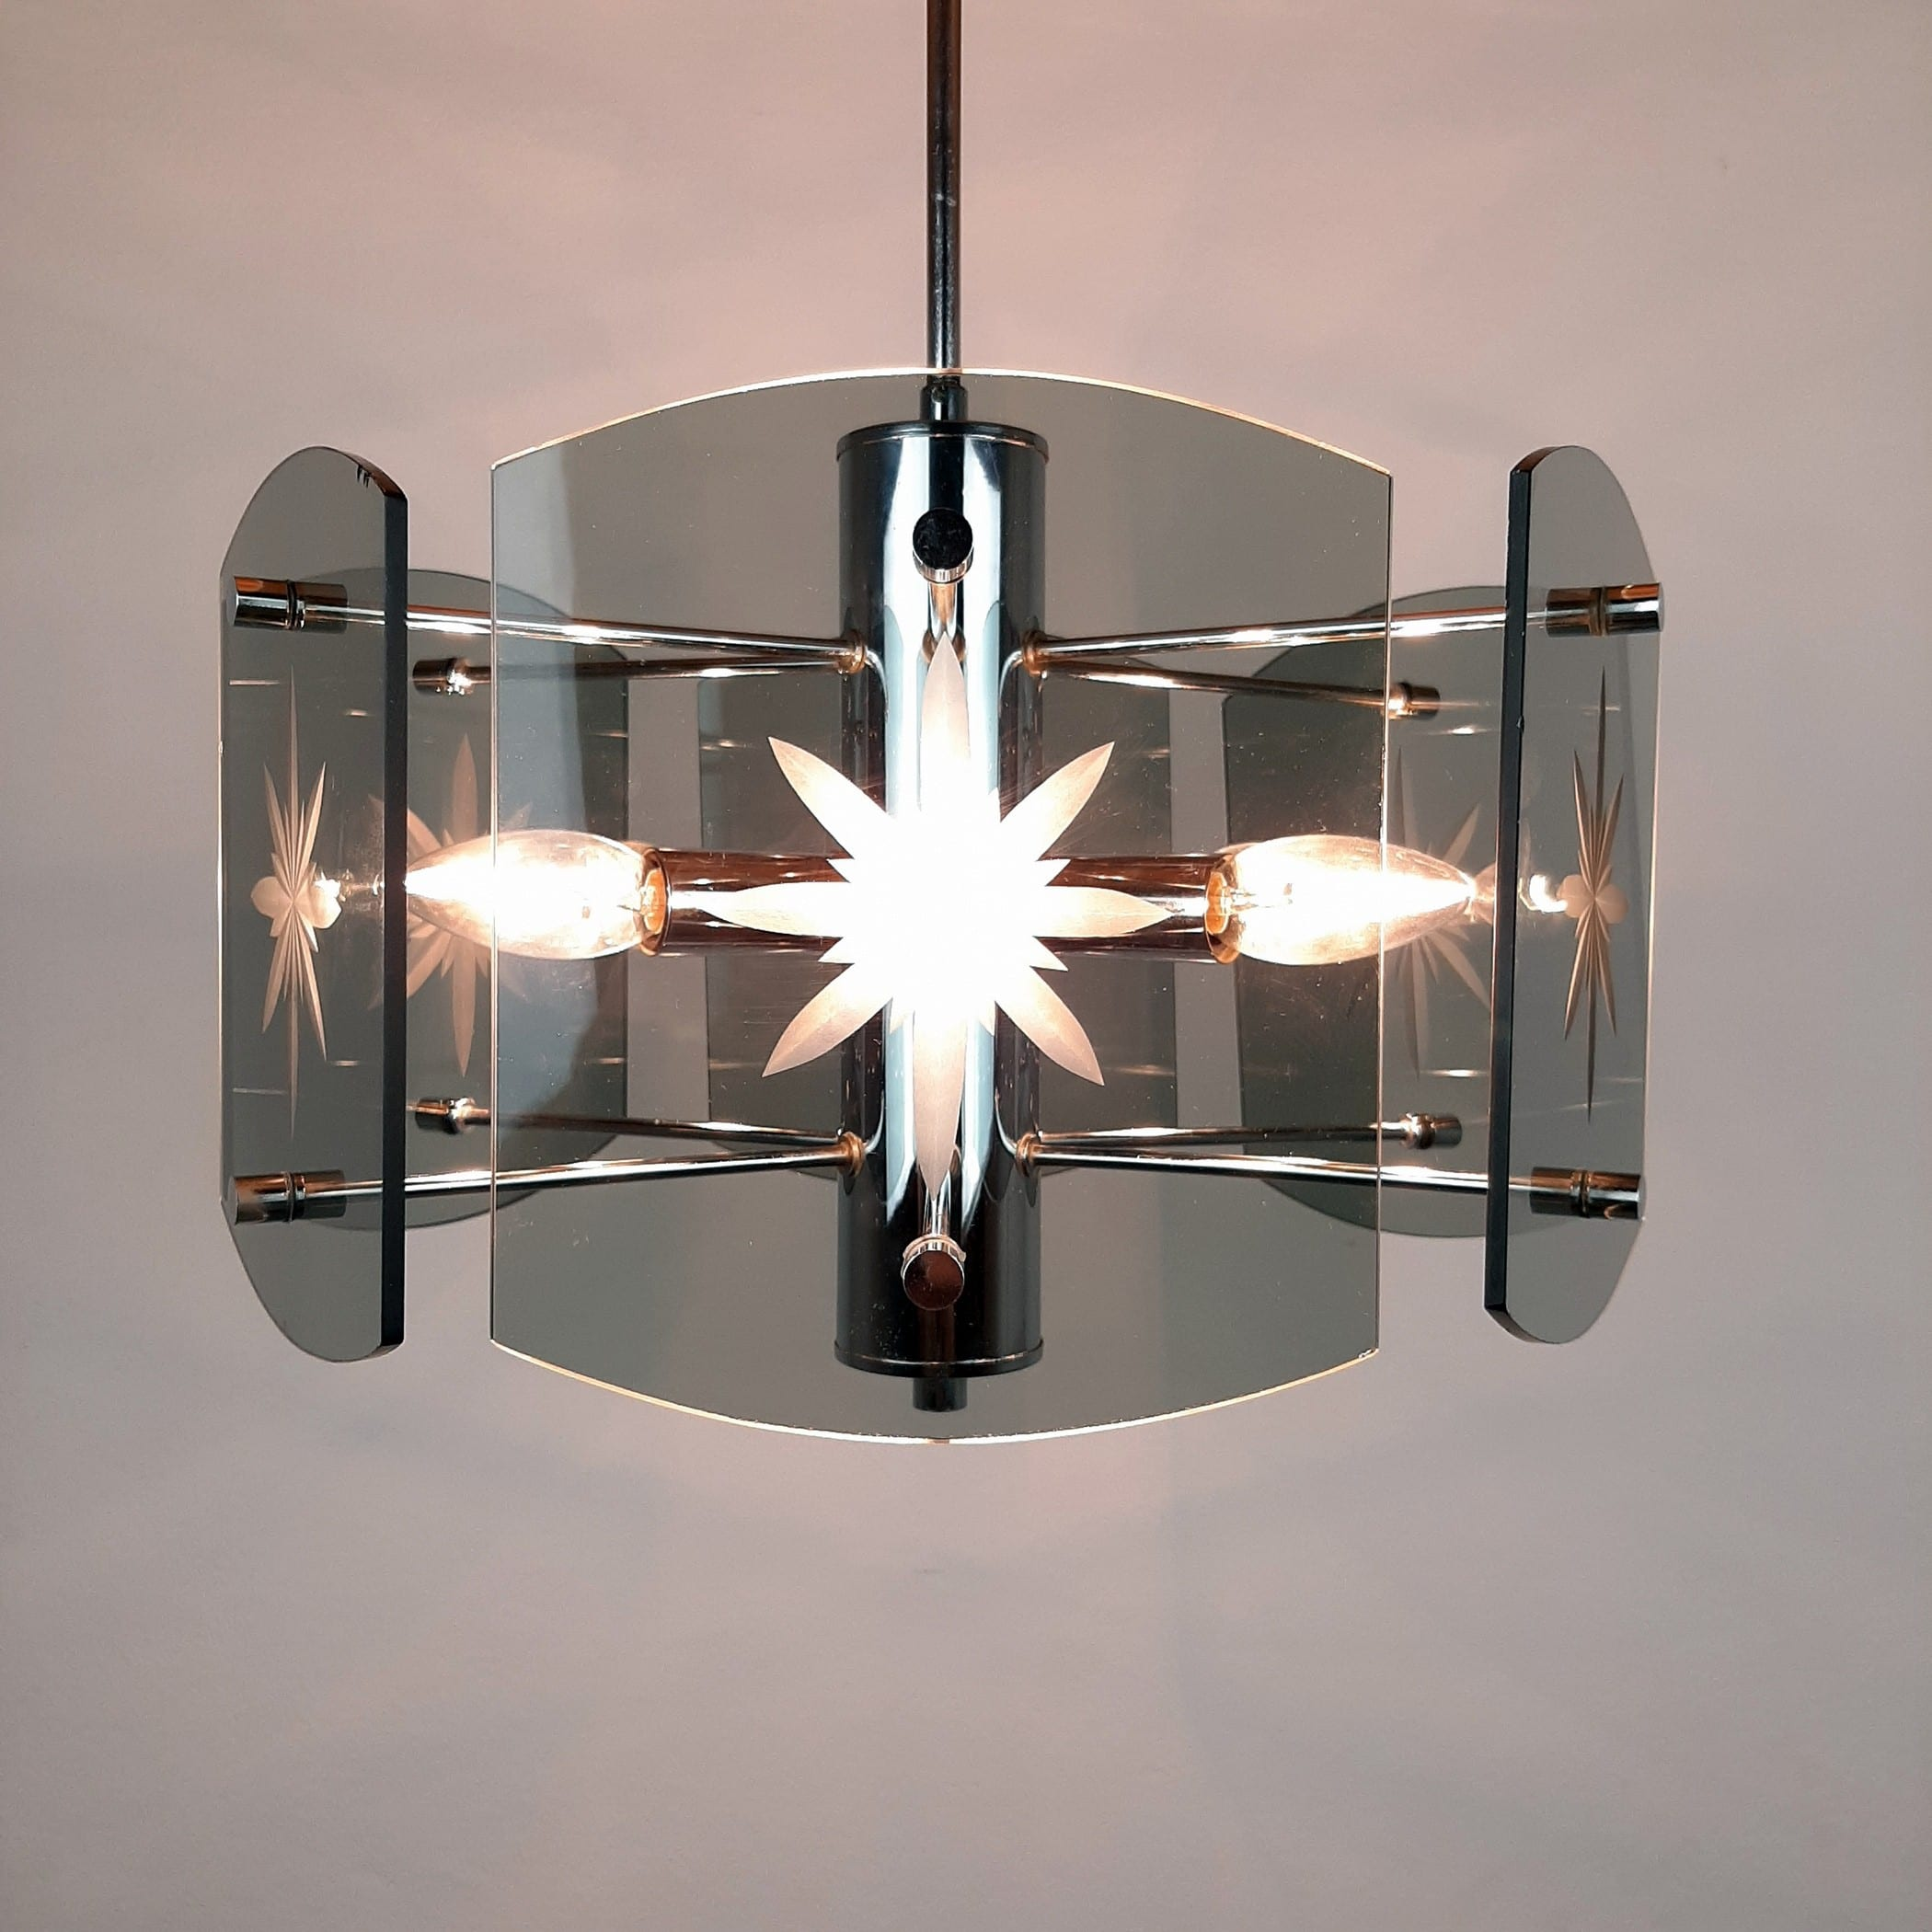 Retro glass pendant lamp EMI Poljcane Yugoslavia '70s Grey & Silver Smoked Glass Mid-century Modern Smoked Glass Fontana Arte Veca Style